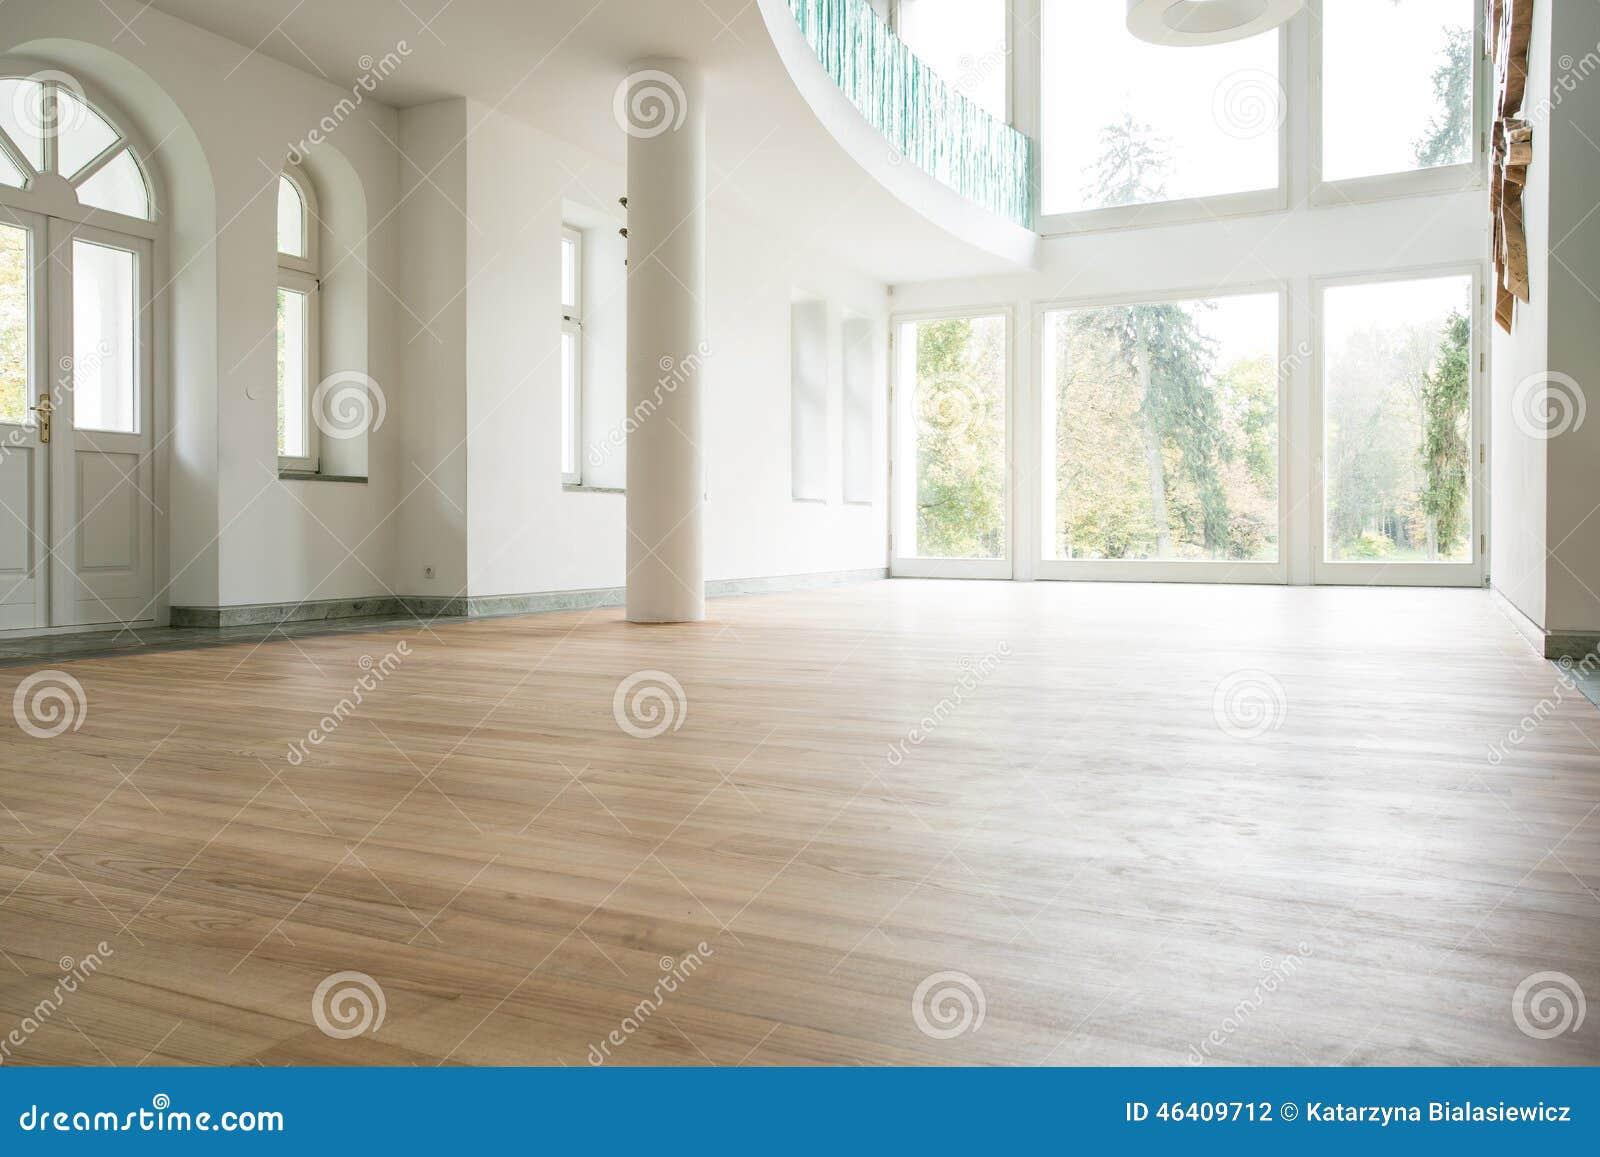 Lege woonkamer stock foto. Afbeelding bestaande uit helder - 46409712